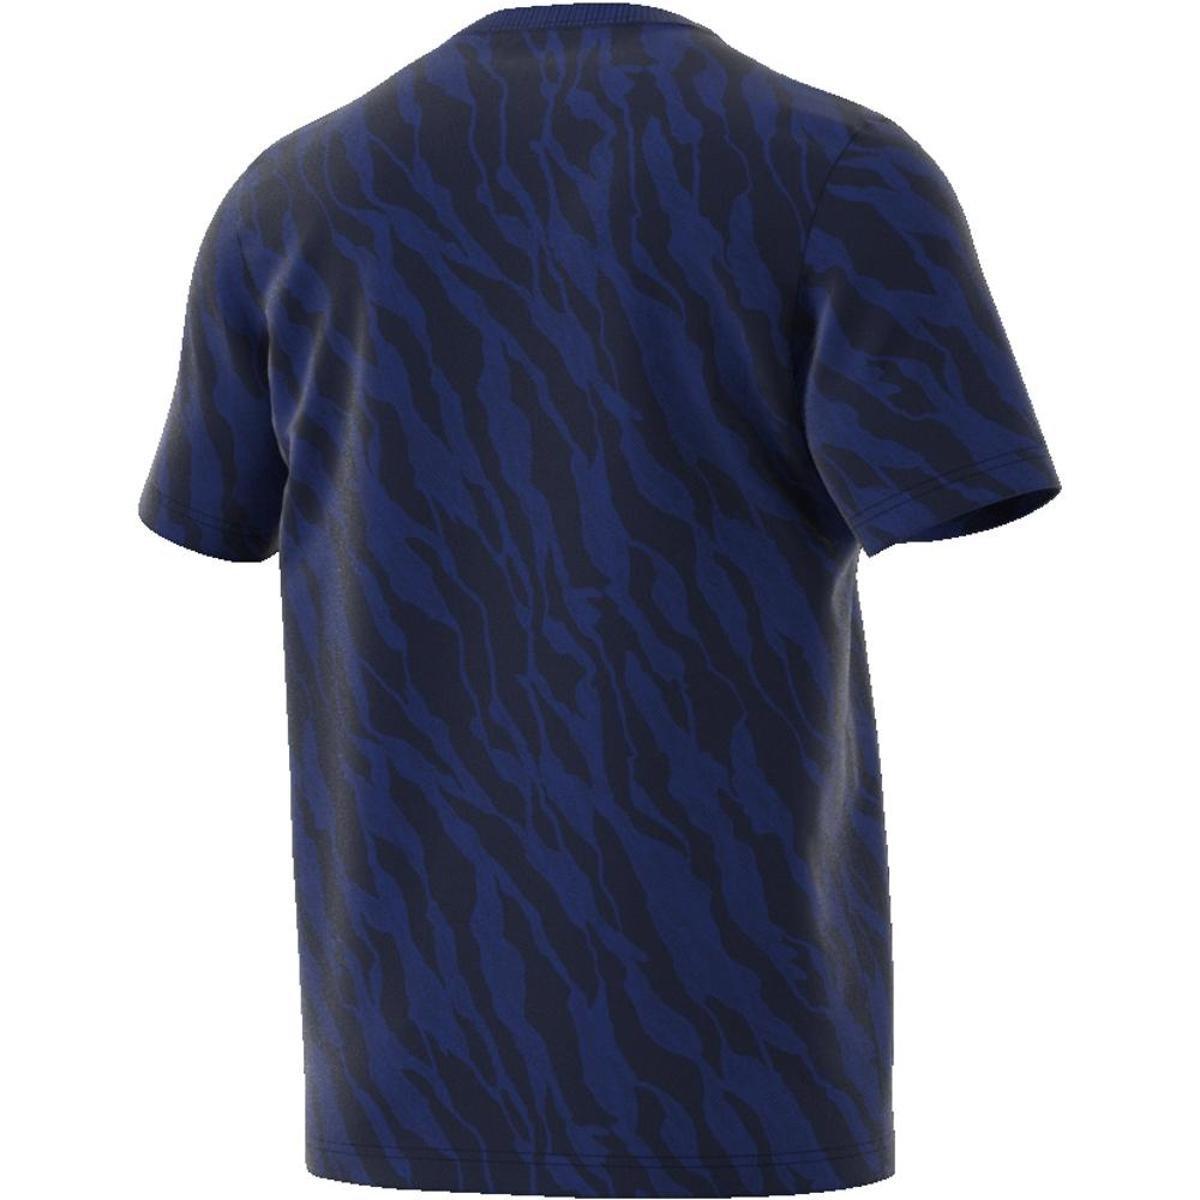 41f3f29af1 Camiseta Adidas Ess Aop Masculina  Camiseta Adidas Ess Aop Masculina ...